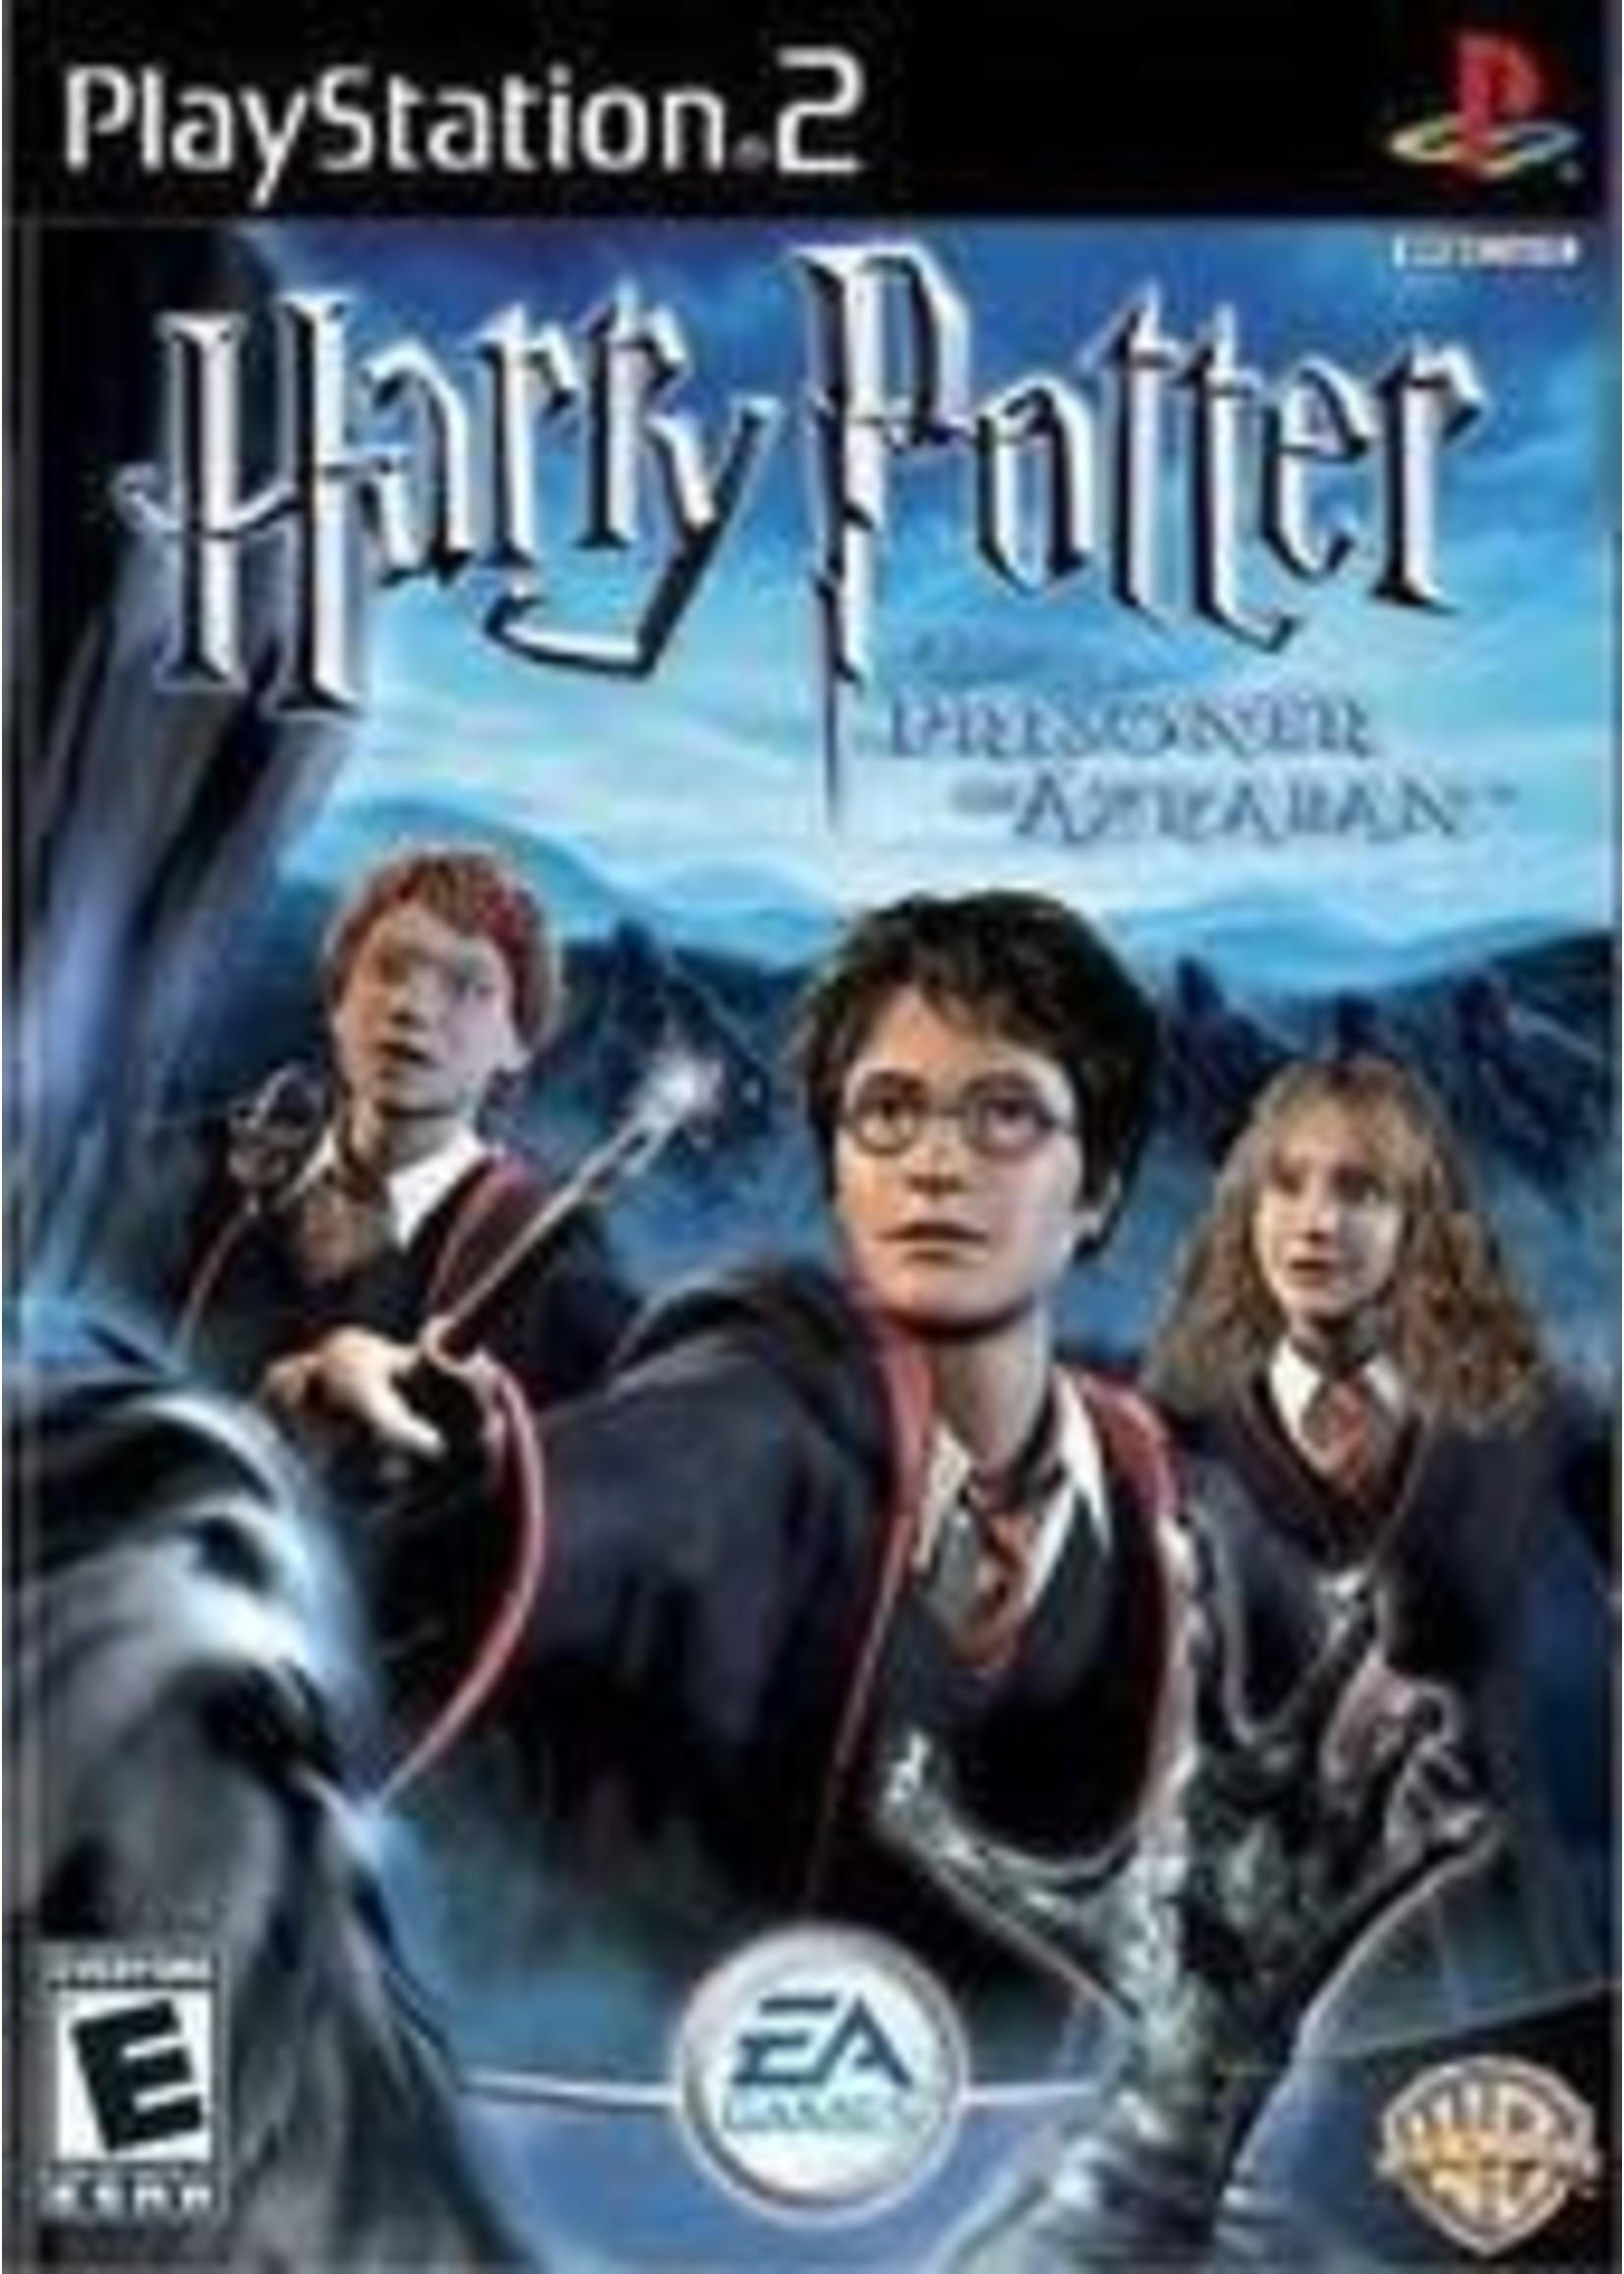 Harry Potter Prisoner Of Azkaban Playstation 2